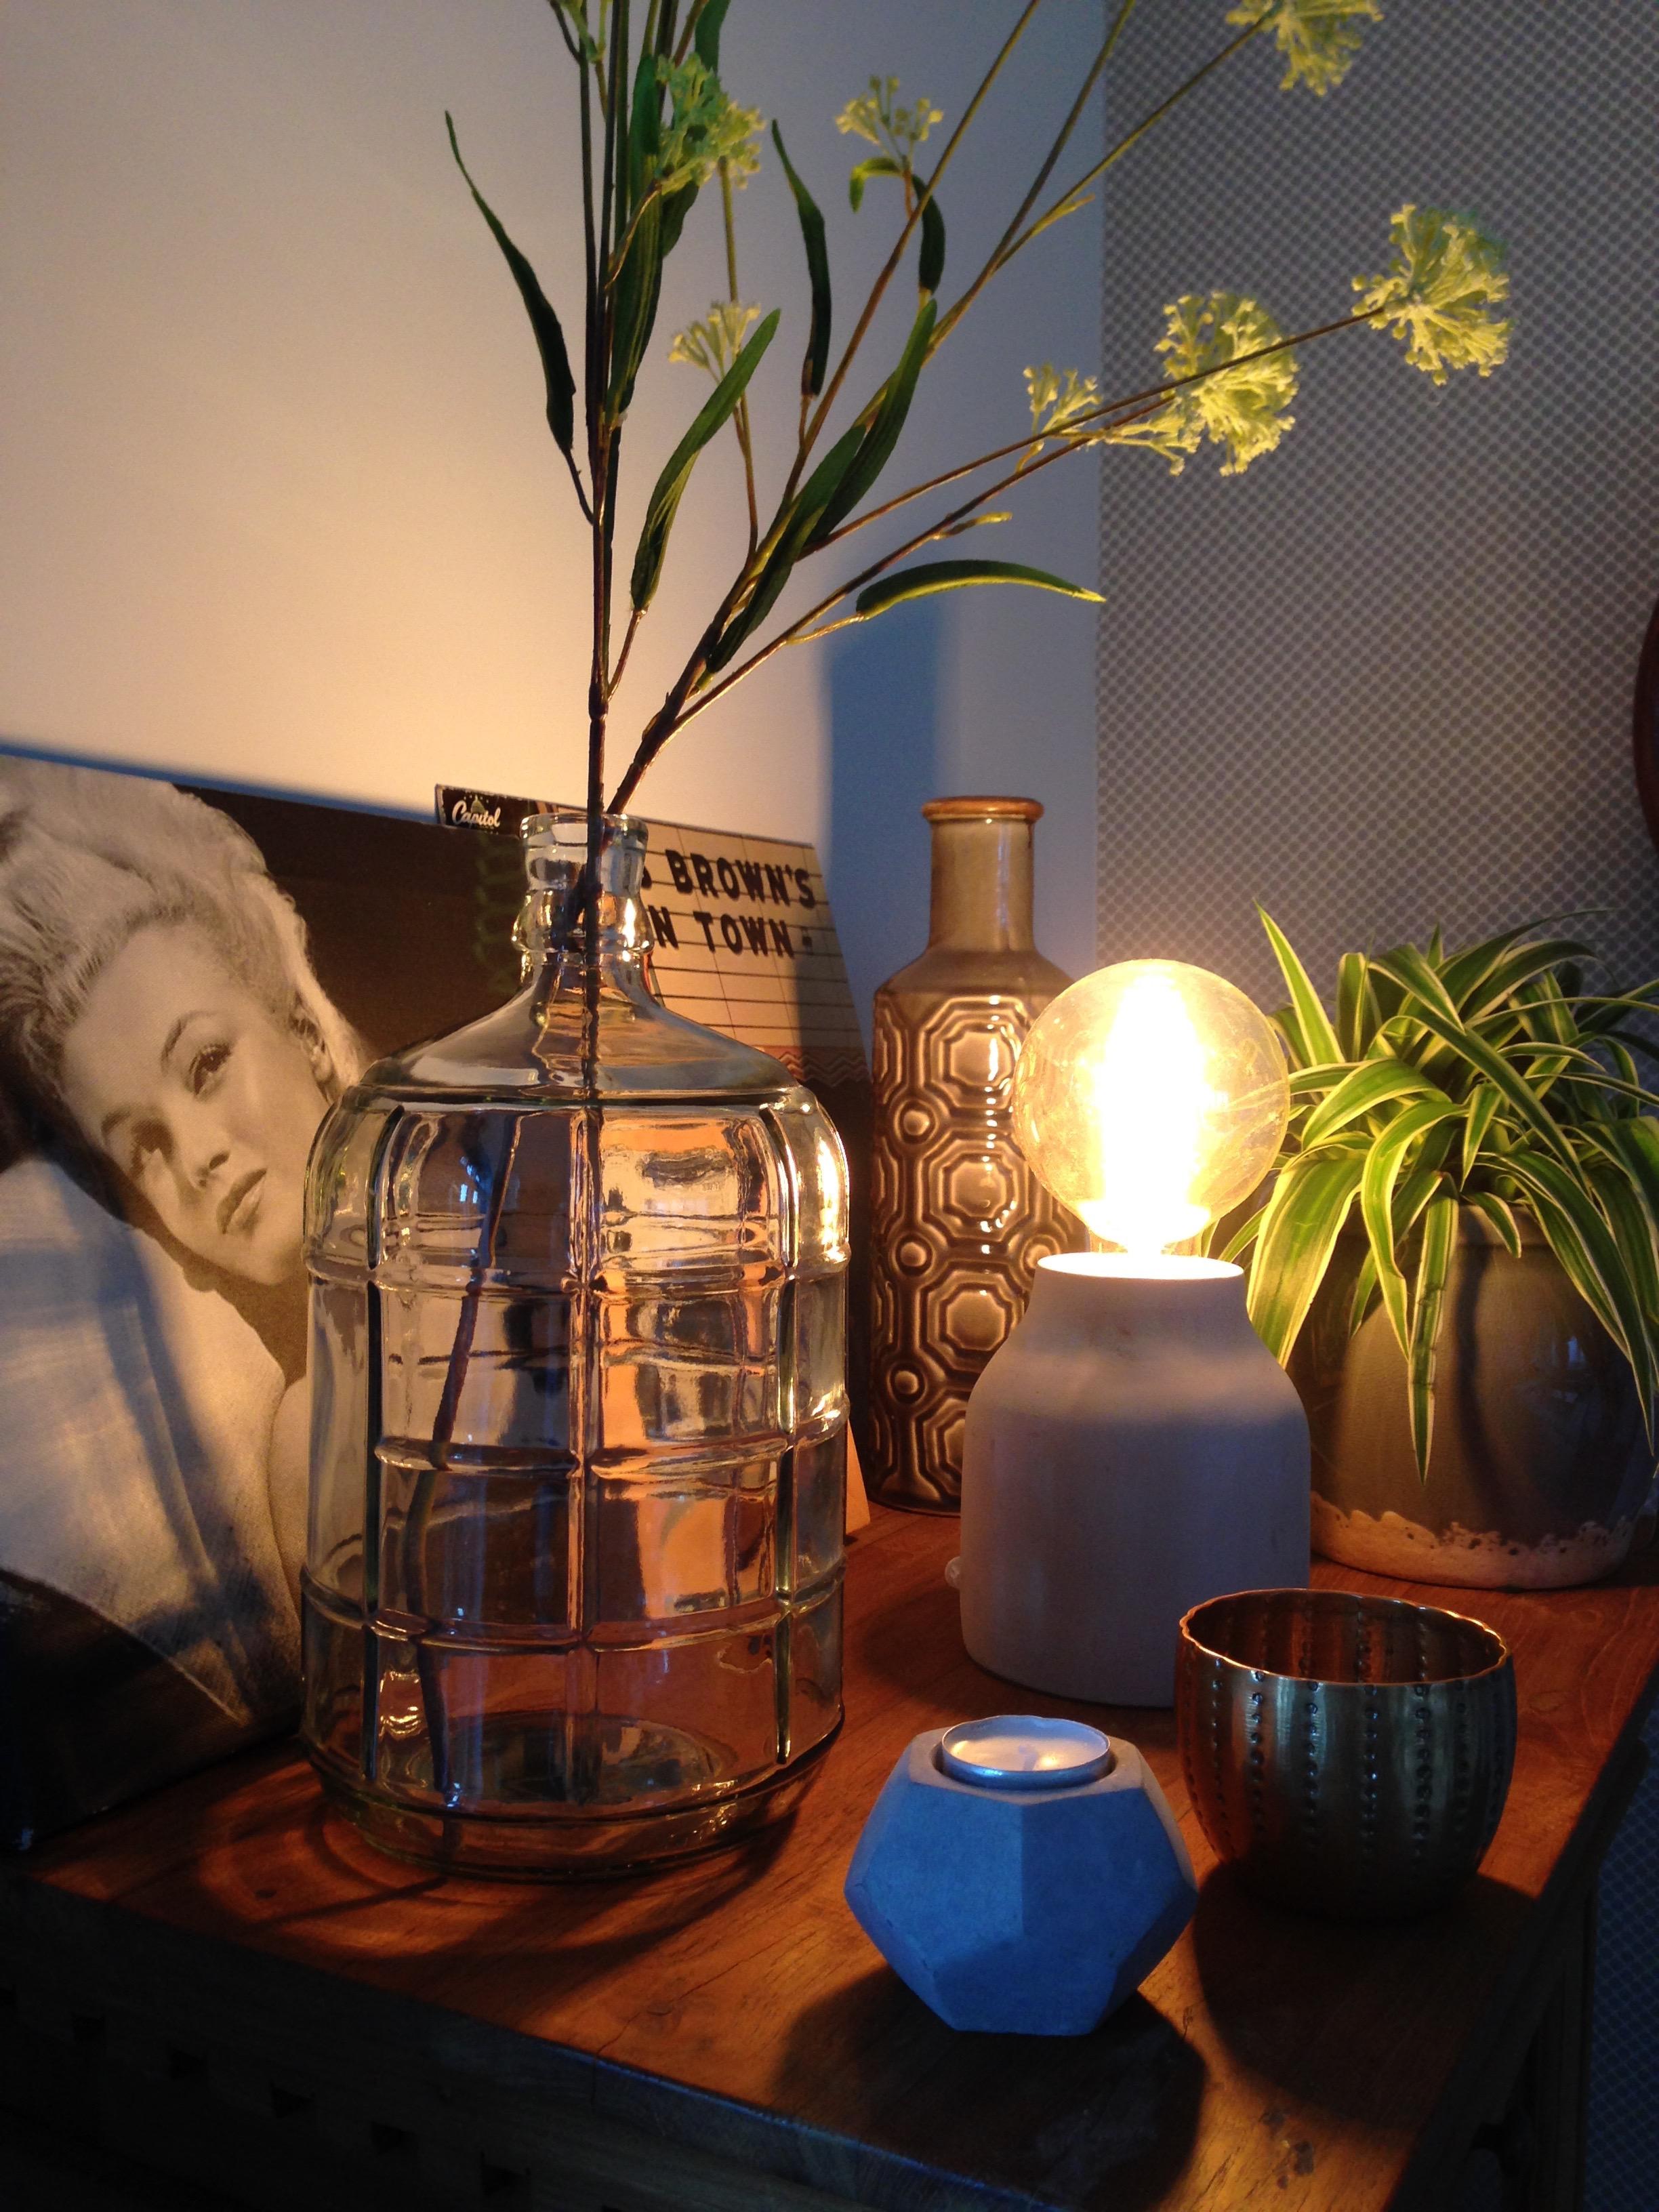 Styling ID blog Welke verlichting maakt jouw interieur compleet? Kunstlicht